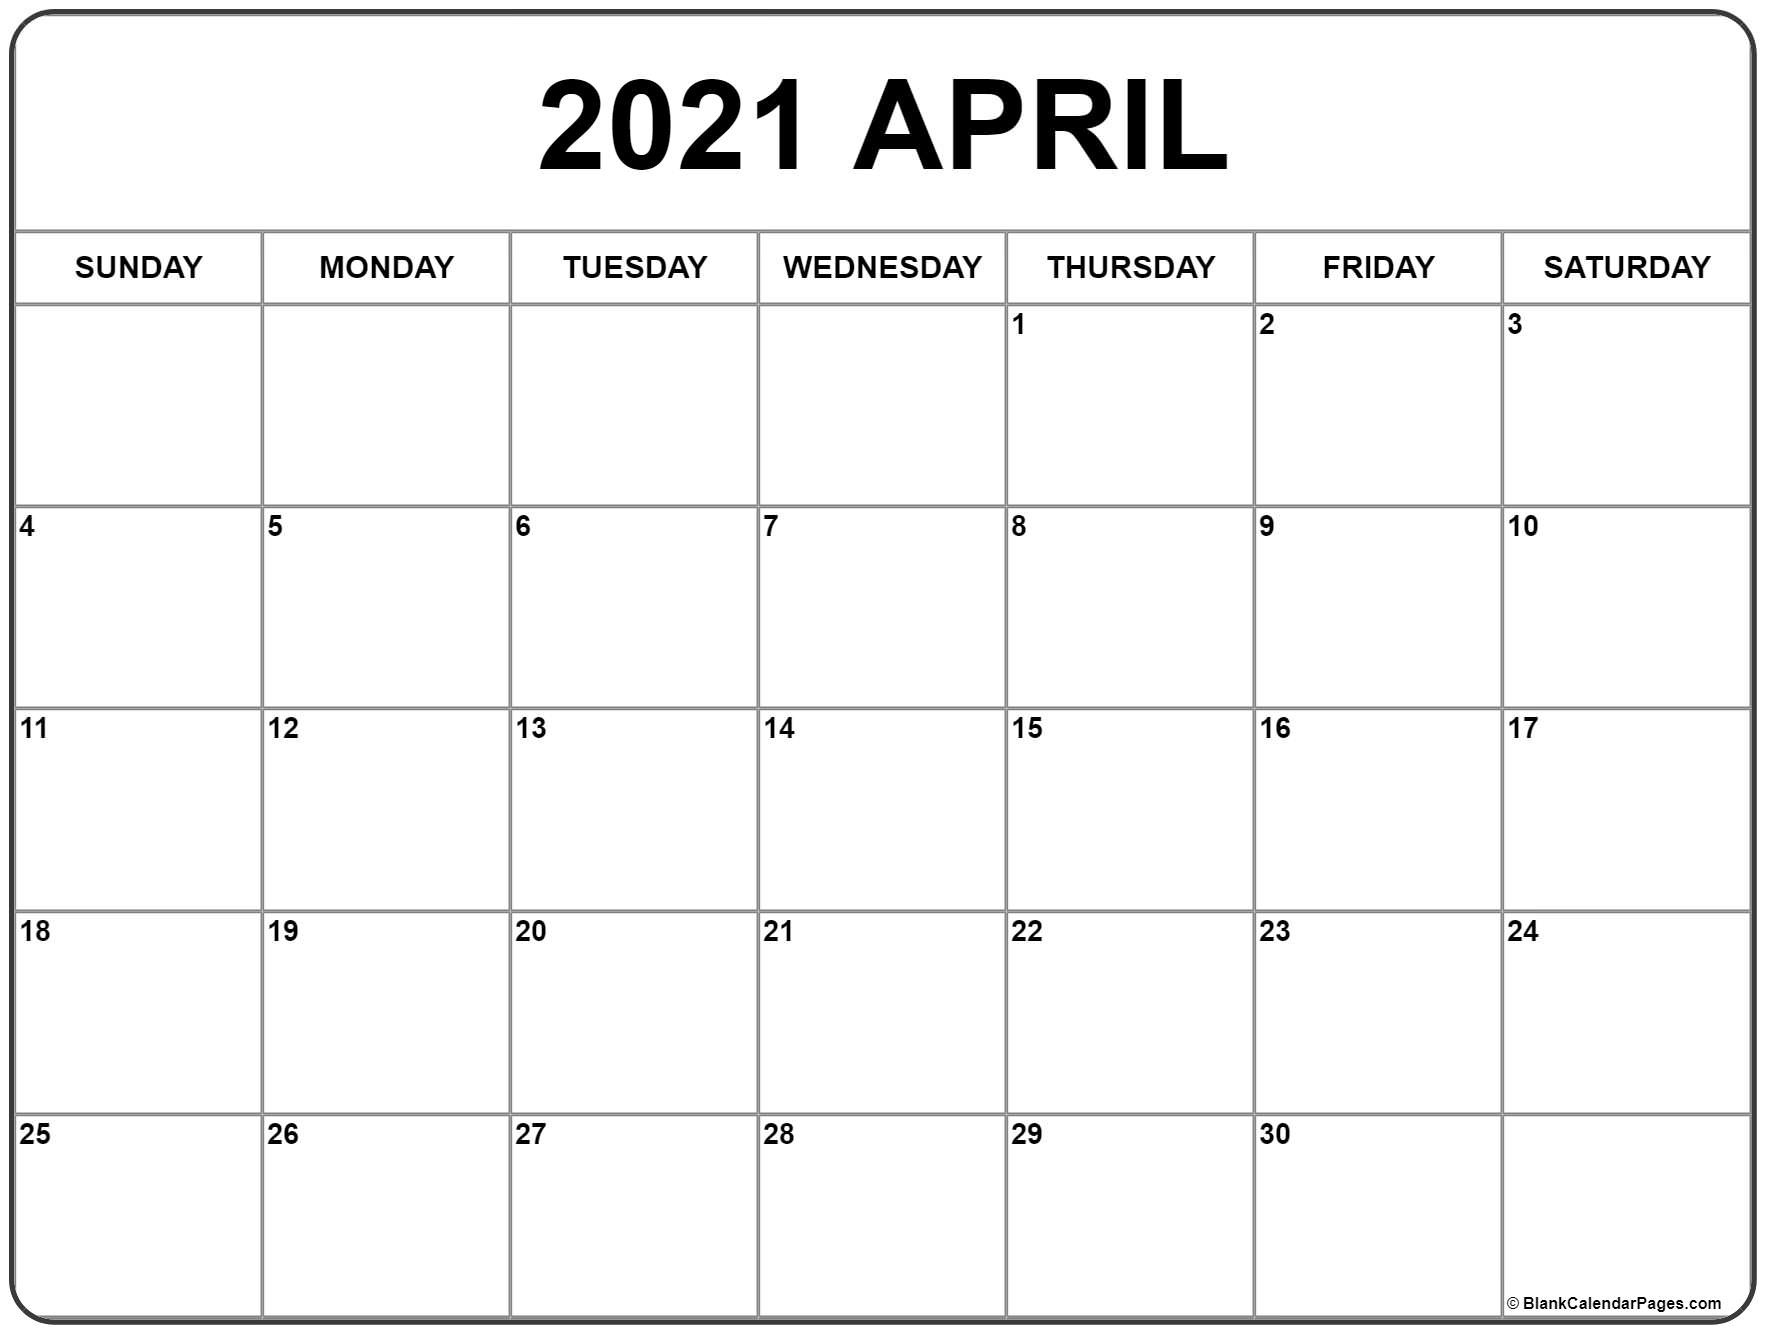 April 2021 Calendar | Free Printable Monthly Calendars  Free Online Calendars 2021 Printable